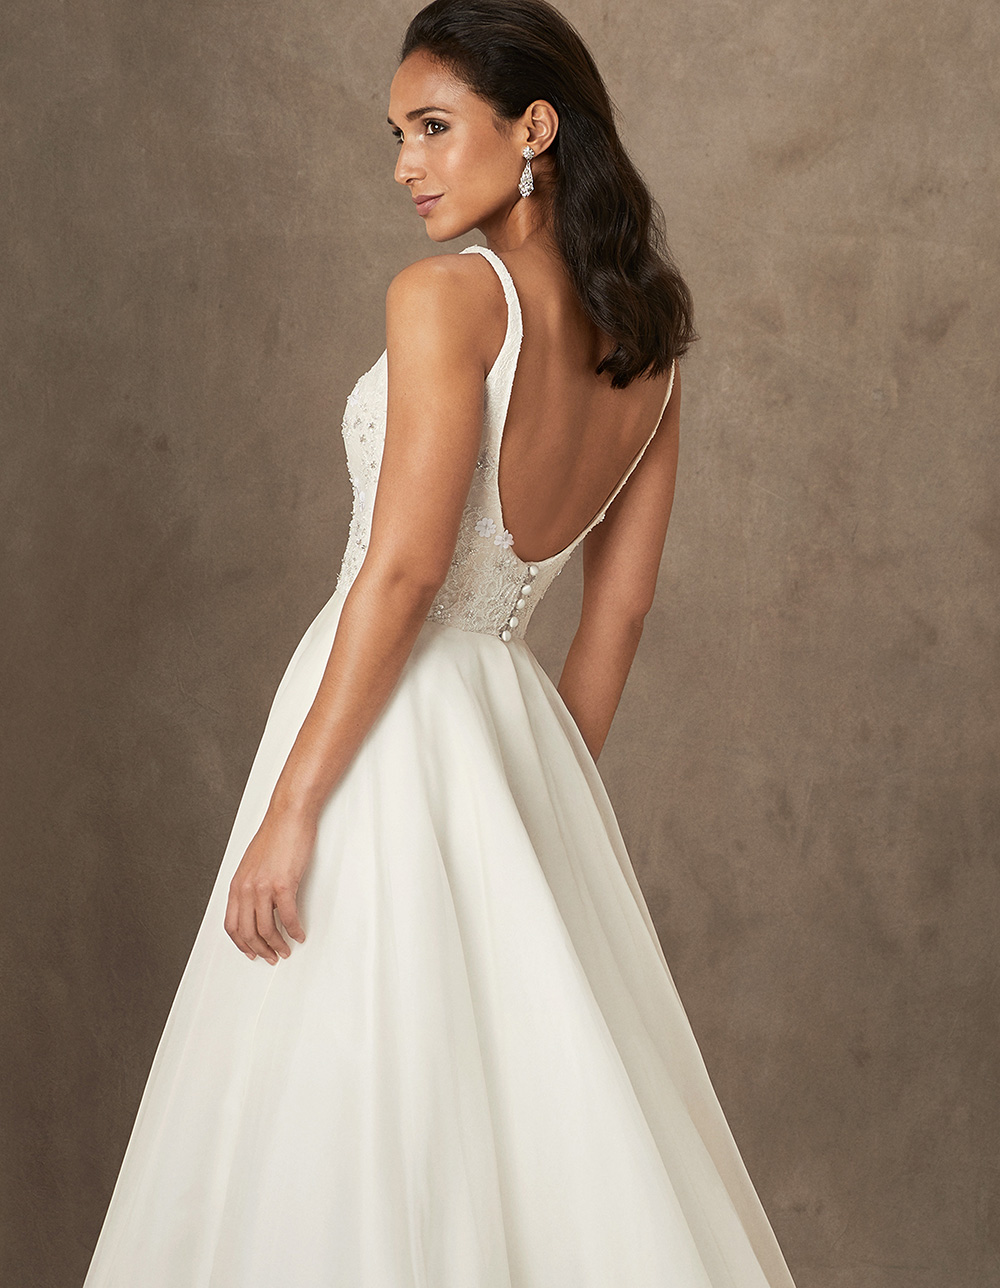 Chrissy luxury wedding gowns by Caroline Castigliano